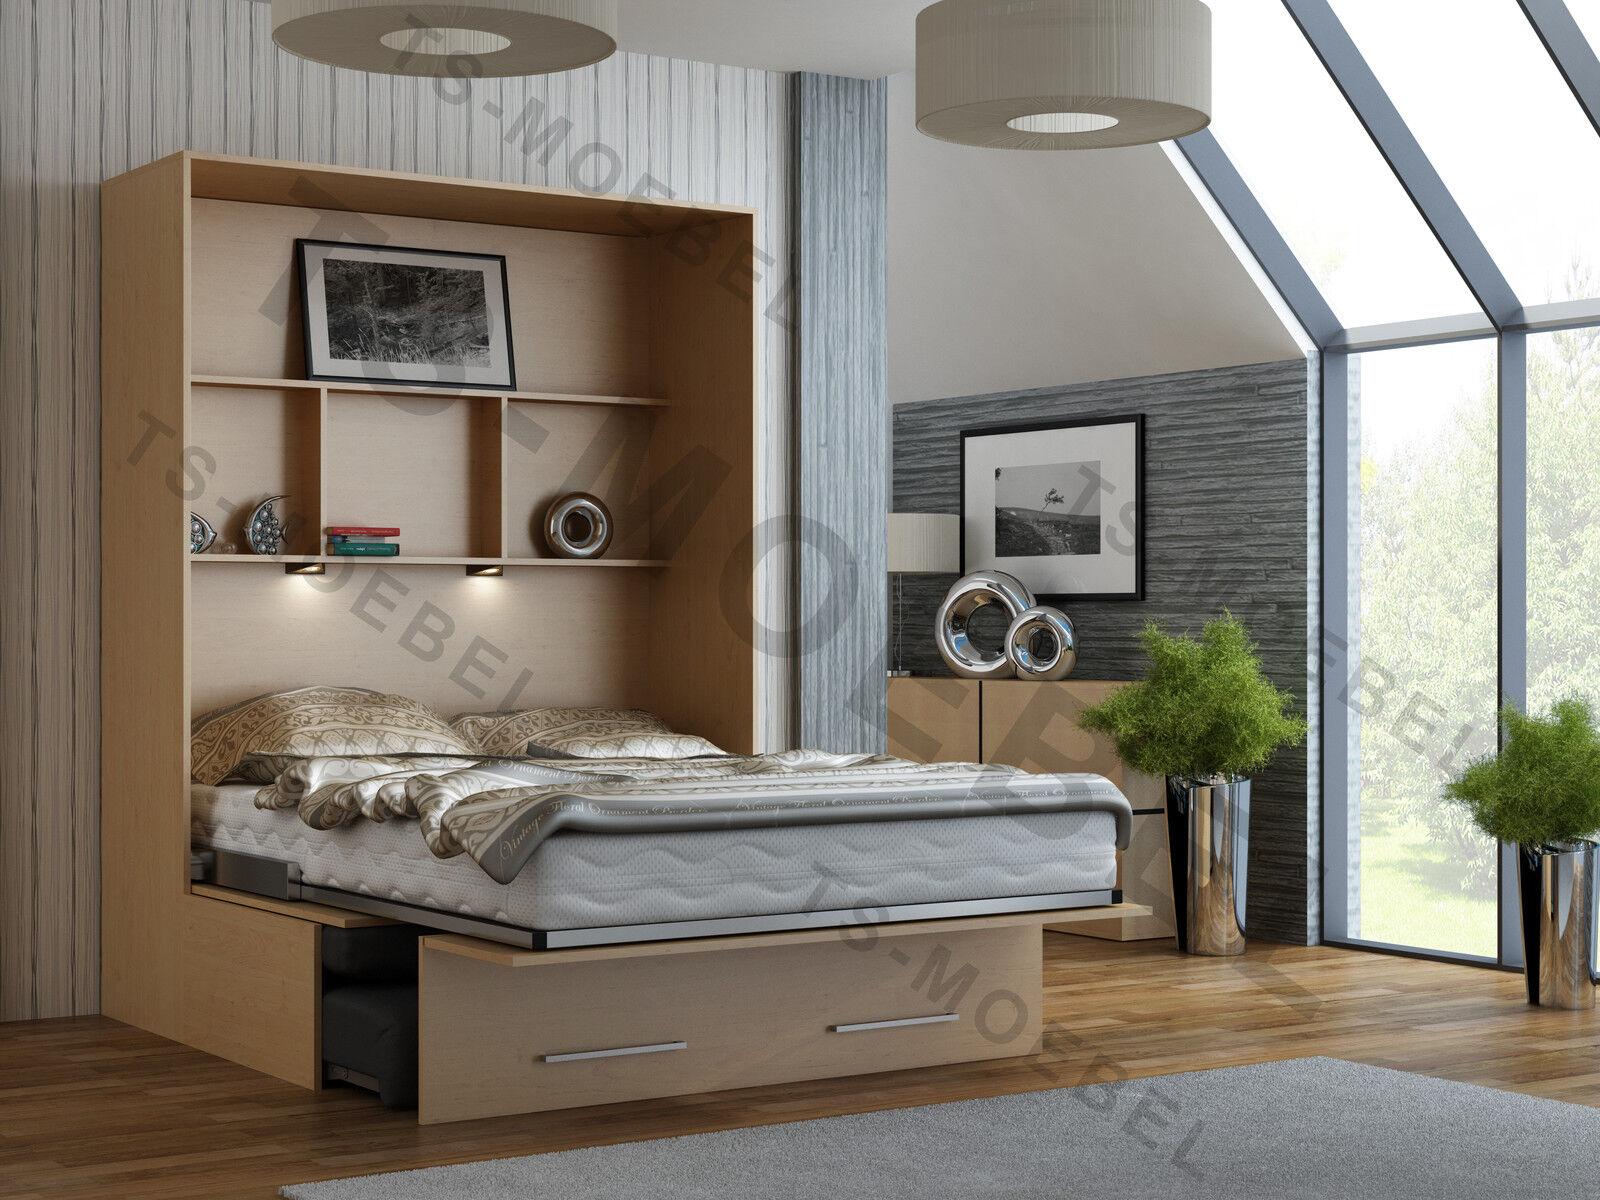 schrankbett wandbett klappbett mit sofa classic. Black Bedroom Furniture Sets. Home Design Ideas